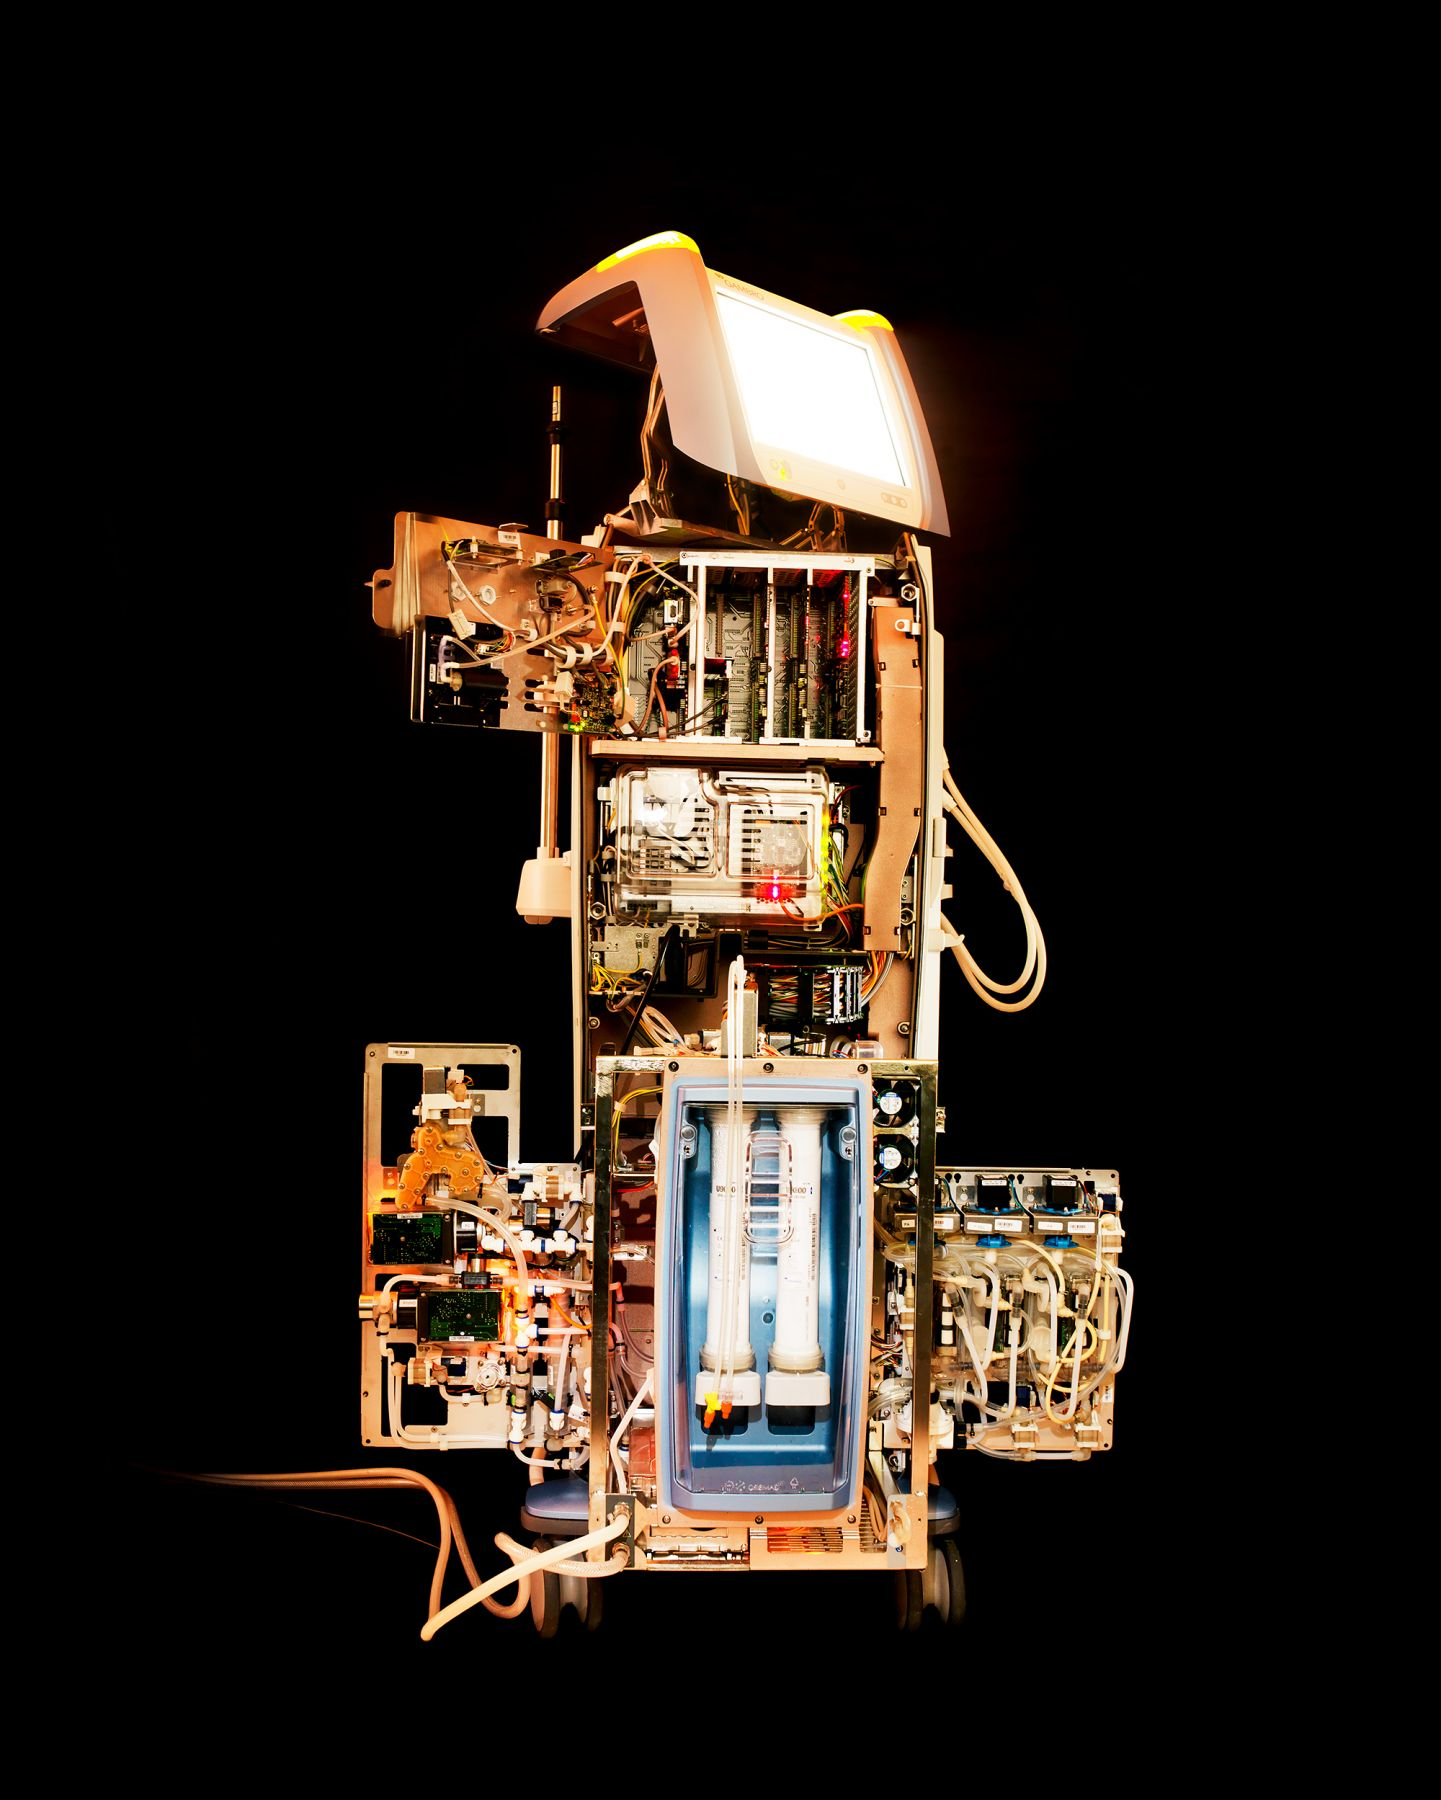 Reiner Riedler, Livesaving Machines, Artis, Dialysis Machine, 2012, Sous Les Etoiles Gallery